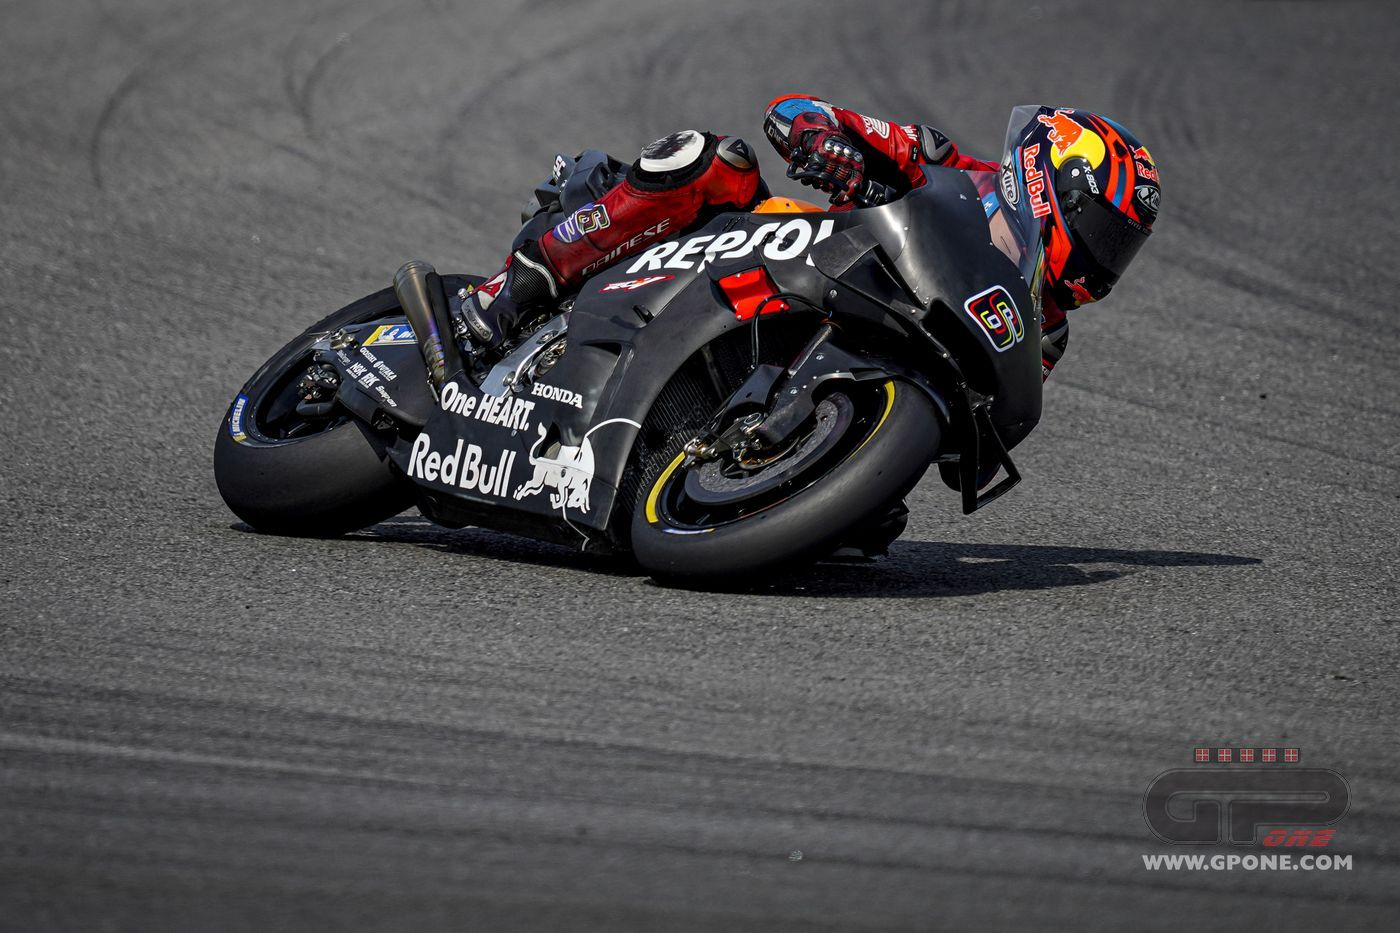 Motogp Honda Test Rider Stefan Bradl At Jerez But I Won T Replace Marquez Gpone Com